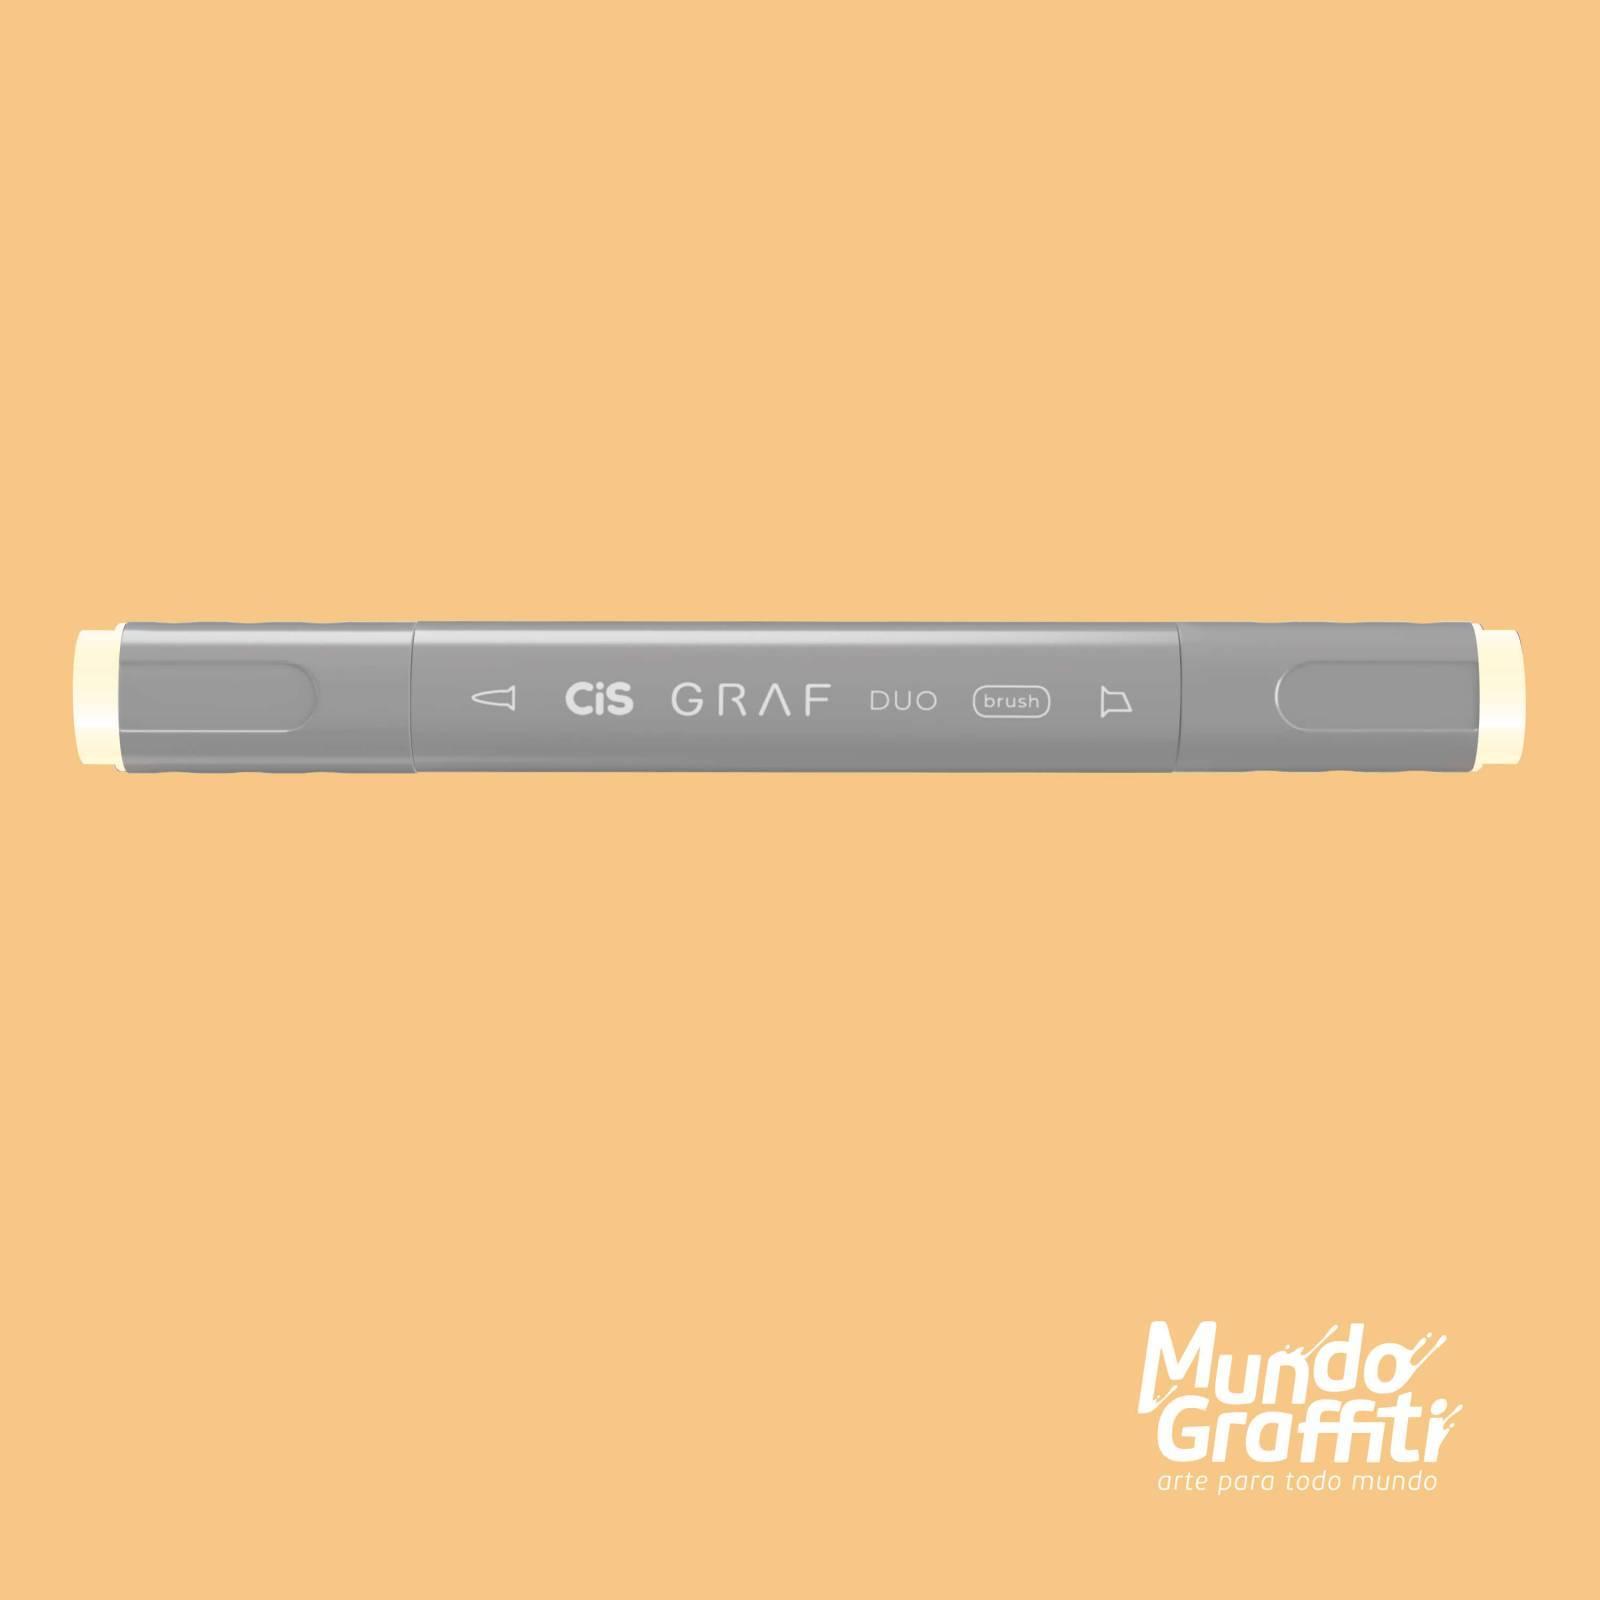 Marcador Cis Graf Duo Brush Pastel Peach 26 - Mundo Graffiti